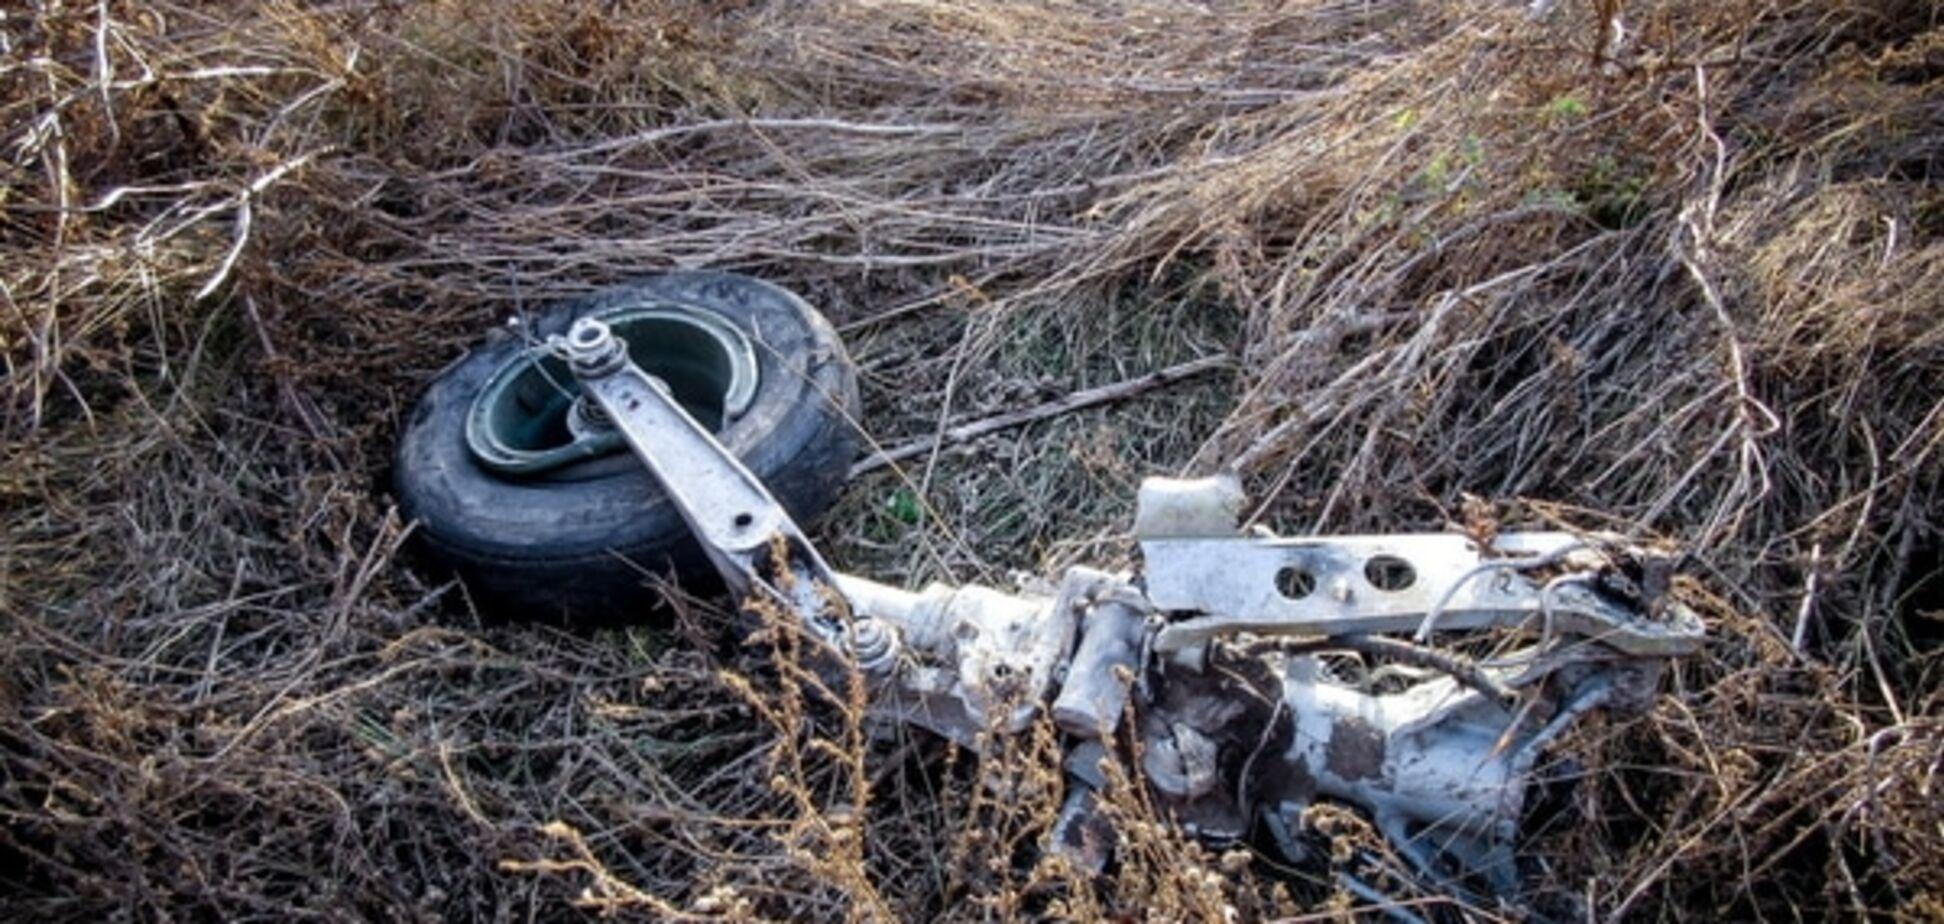 Обломки СУ-25 разлетелись на километр: новые фото с места аварии